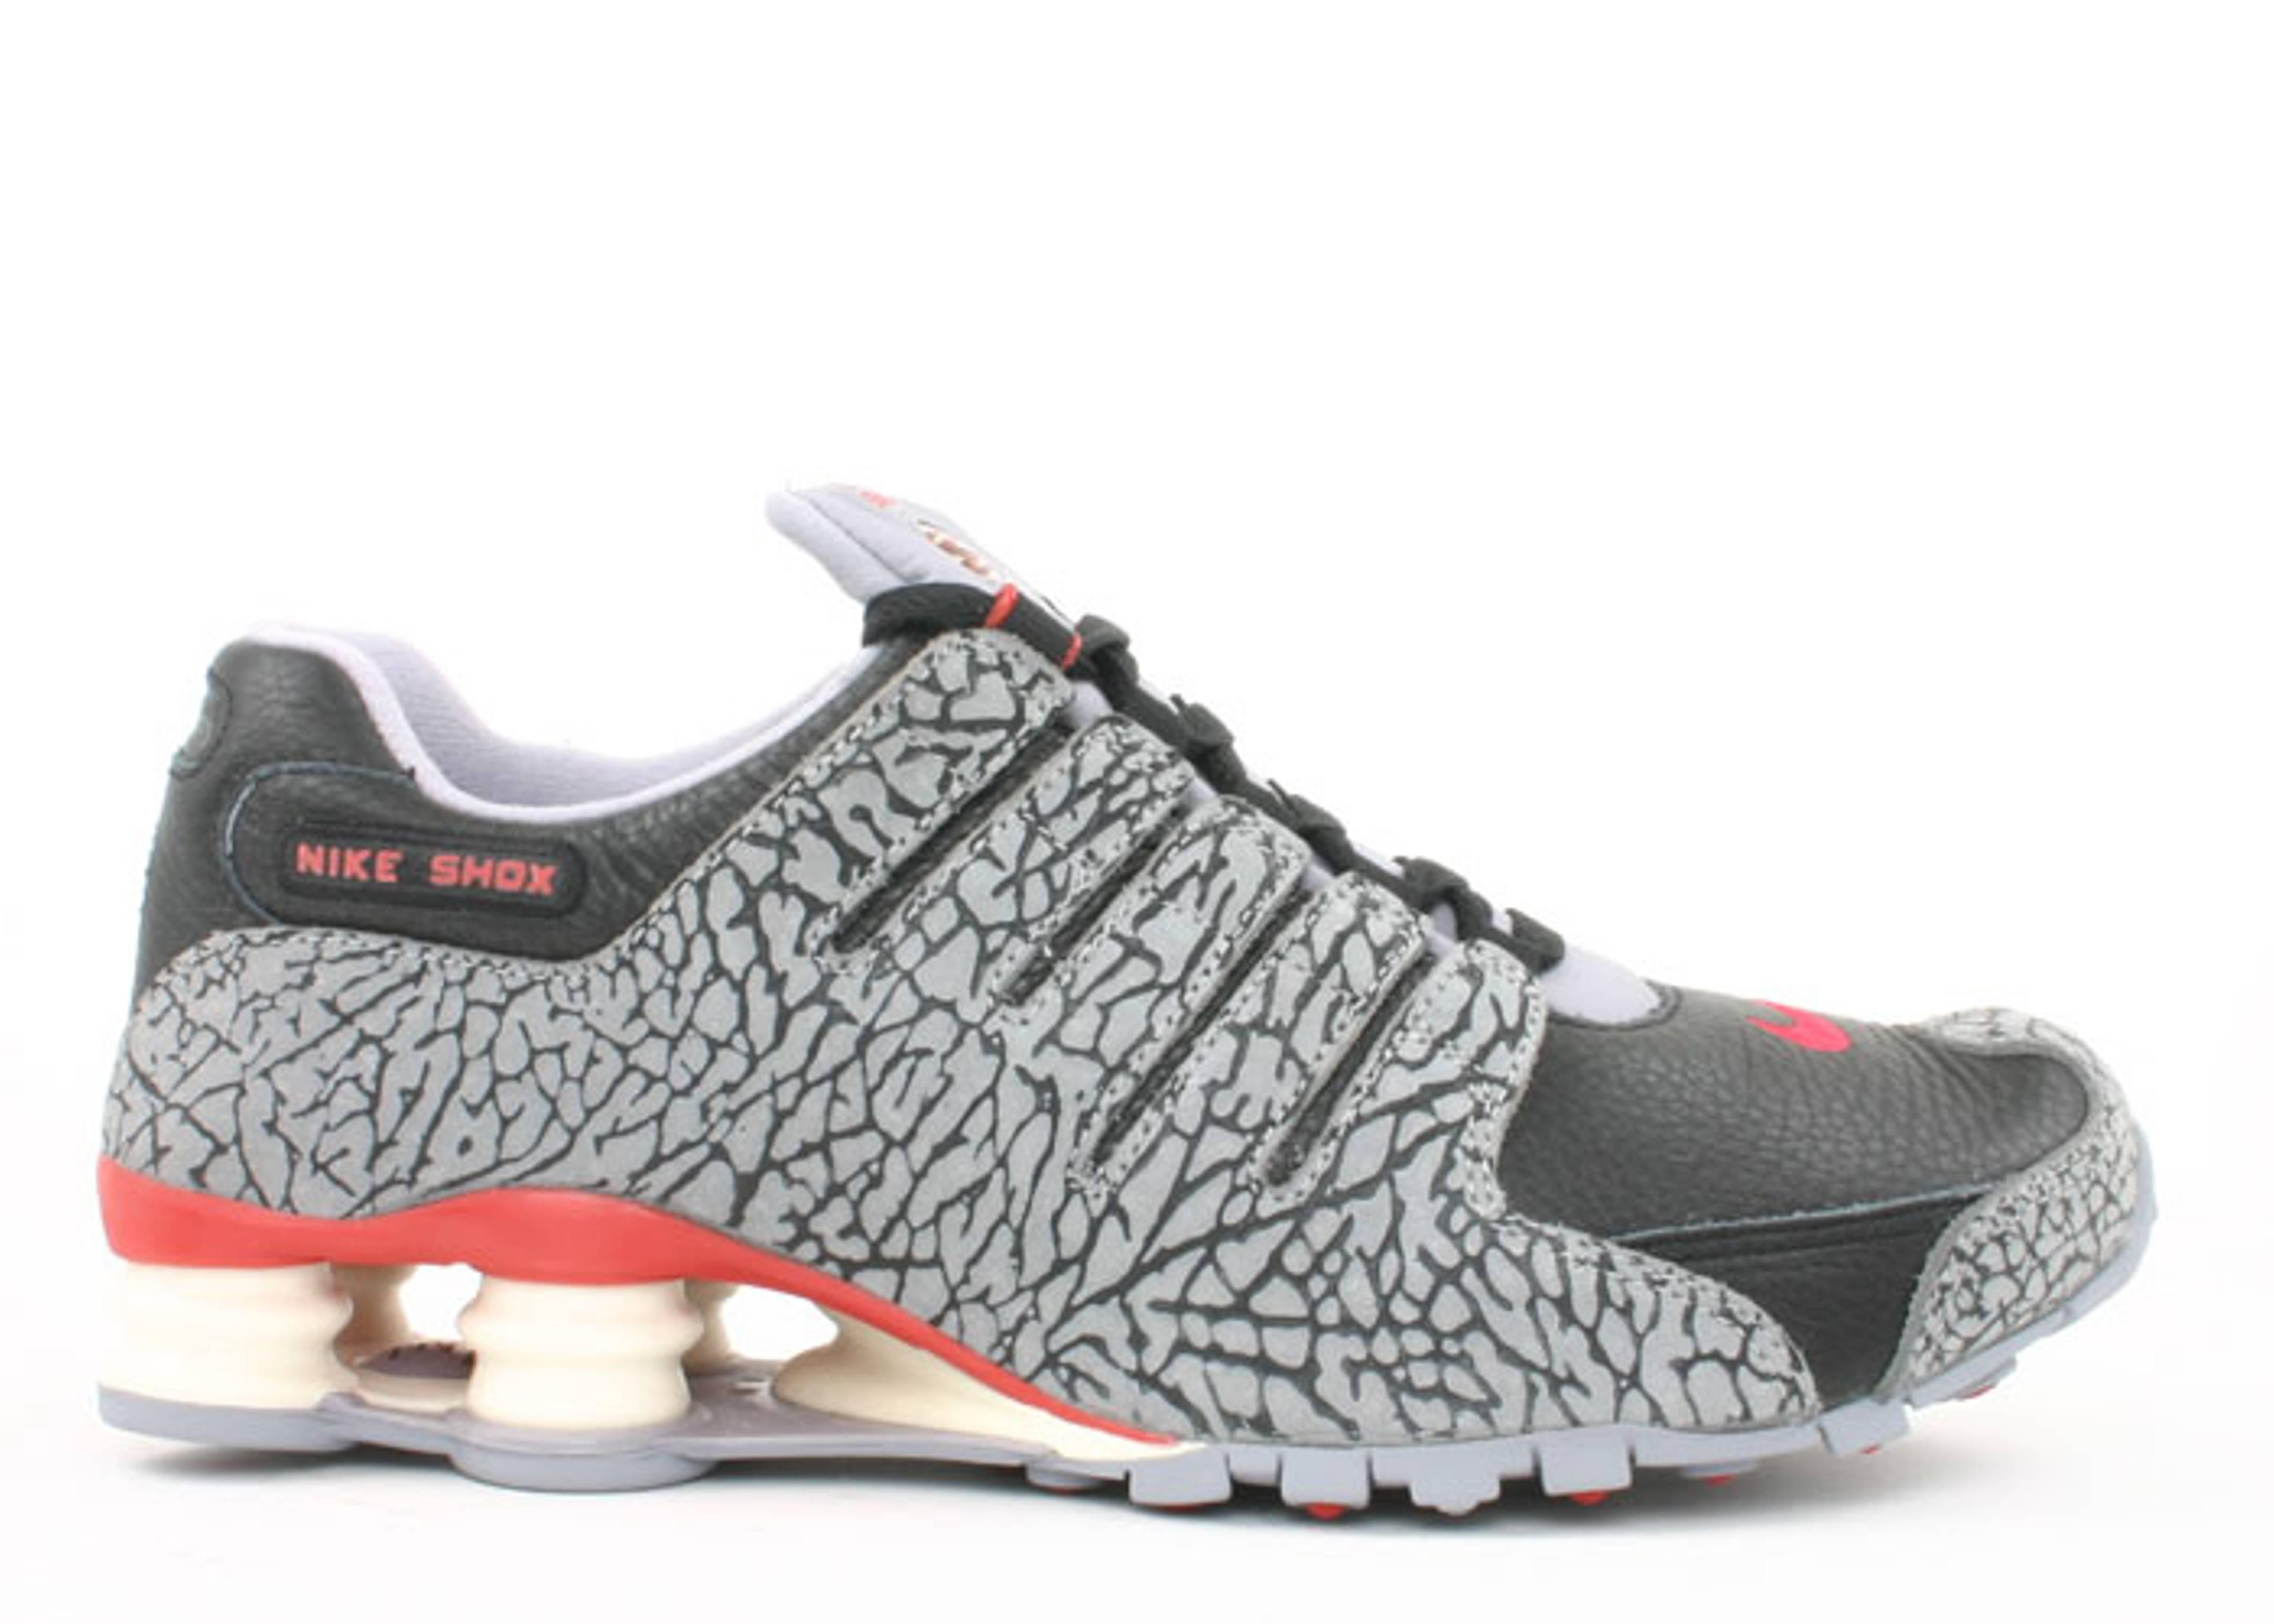 Nike Shox Grey And Teal